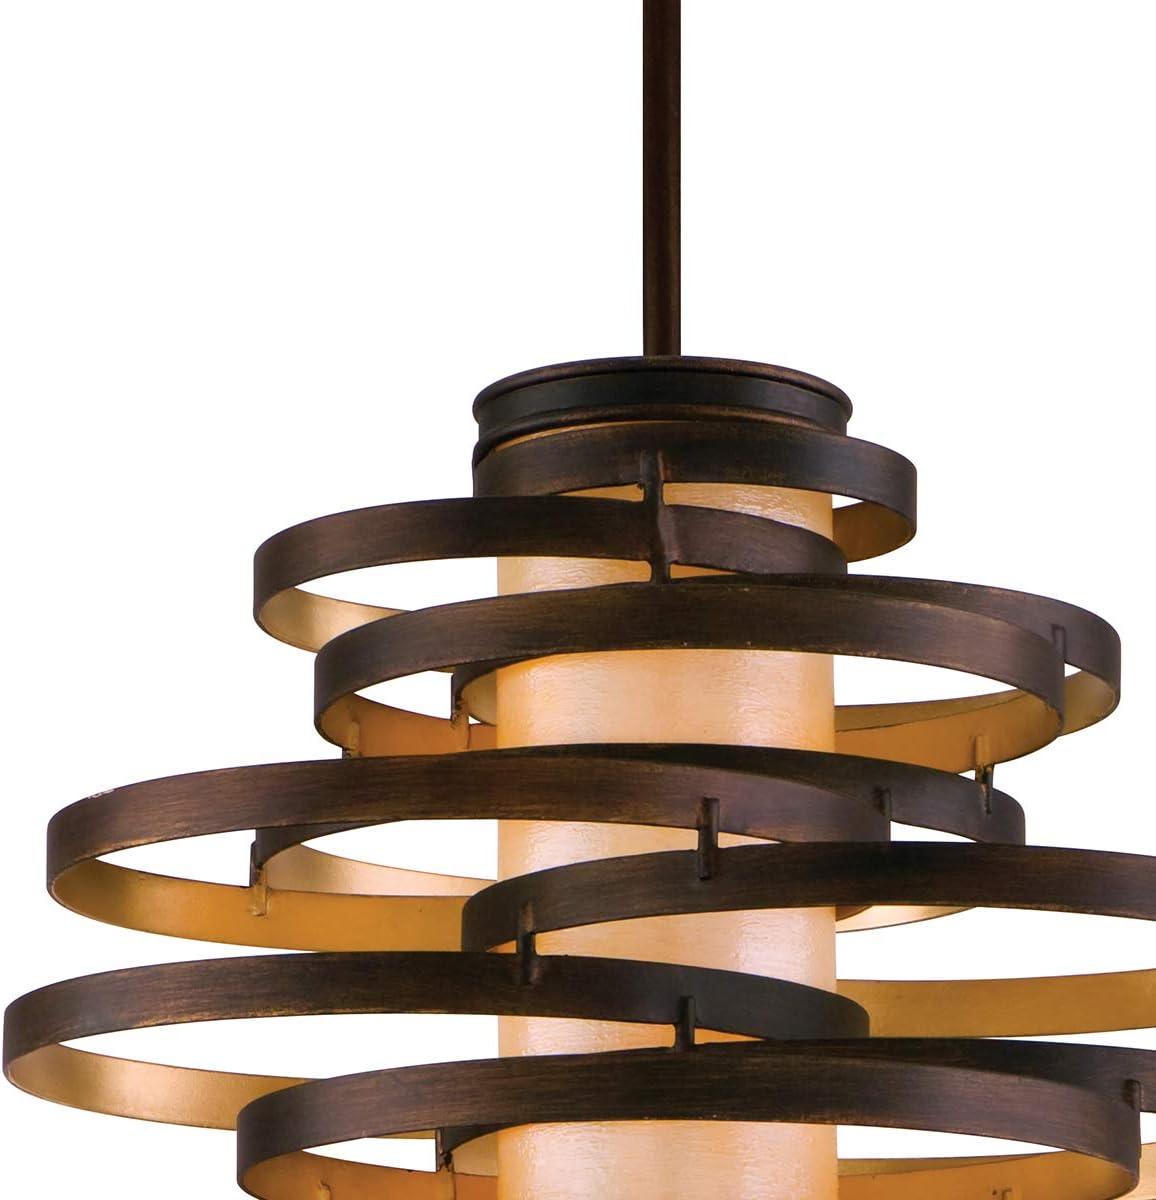 Vertigo Pendant – 23 – Bronze with Gold Leaf Finish with Caramel Ice Diffuser